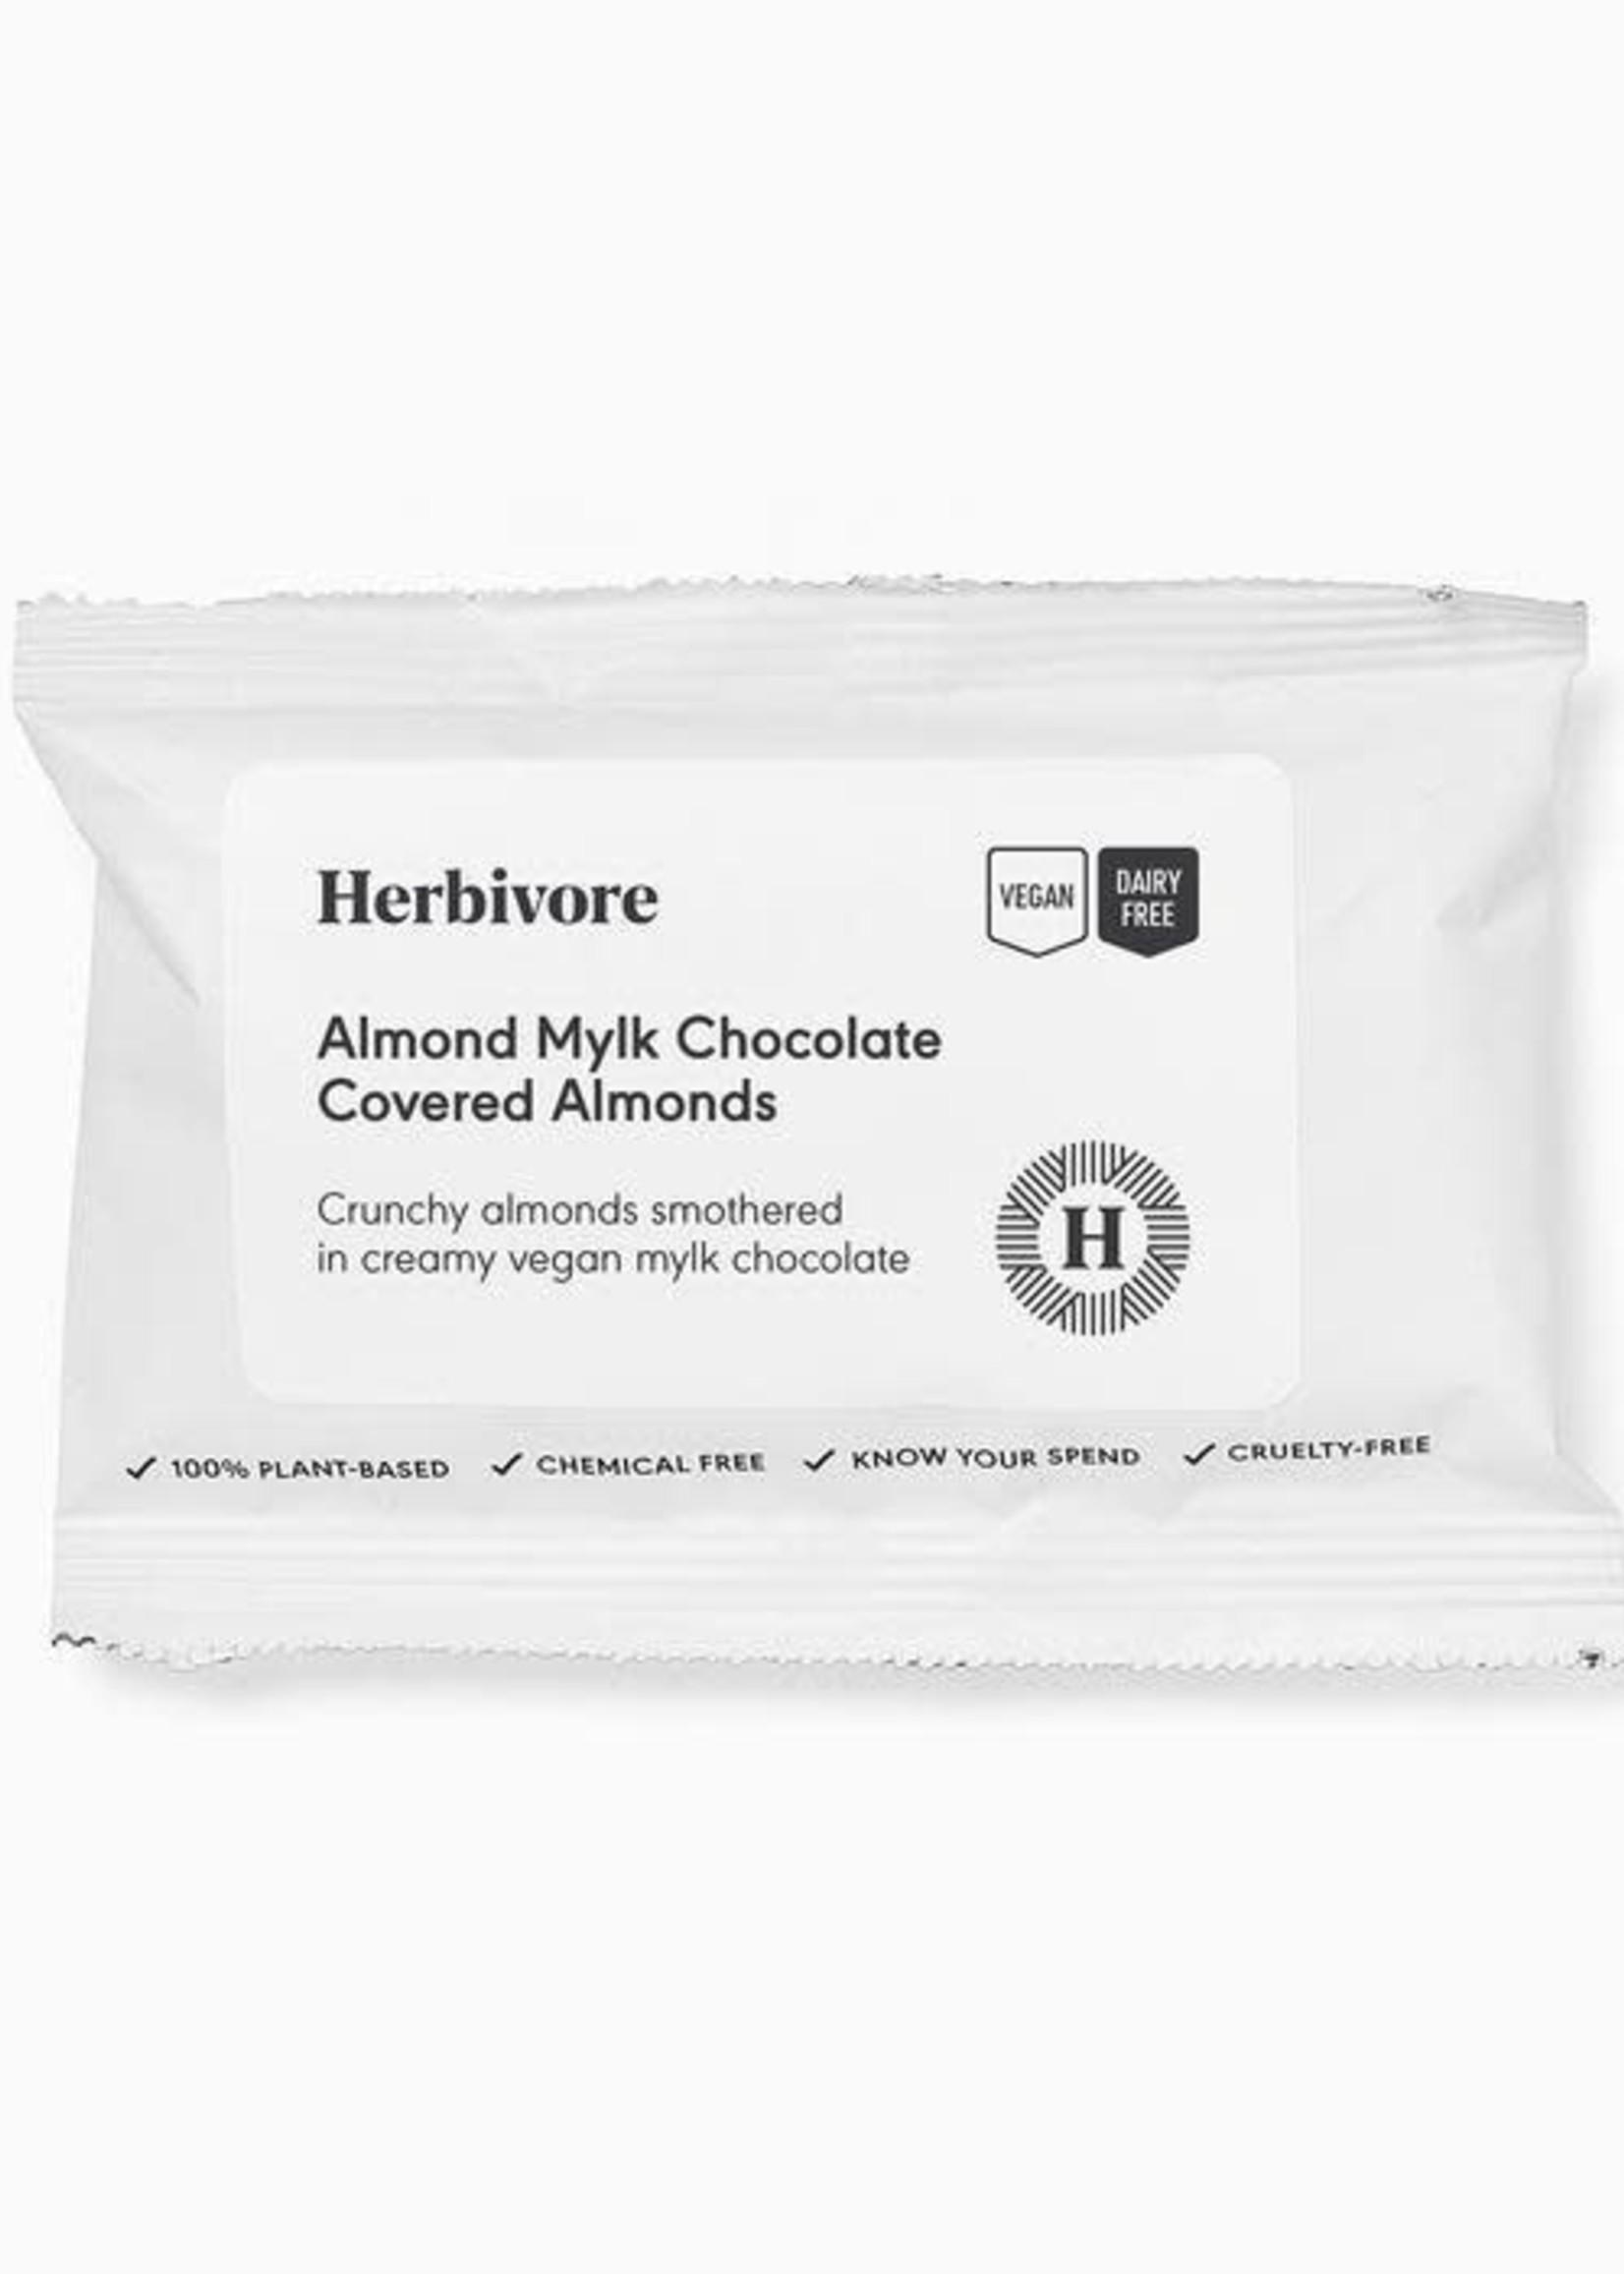 Herbivore - Almond Mylk chocolate covered almonds